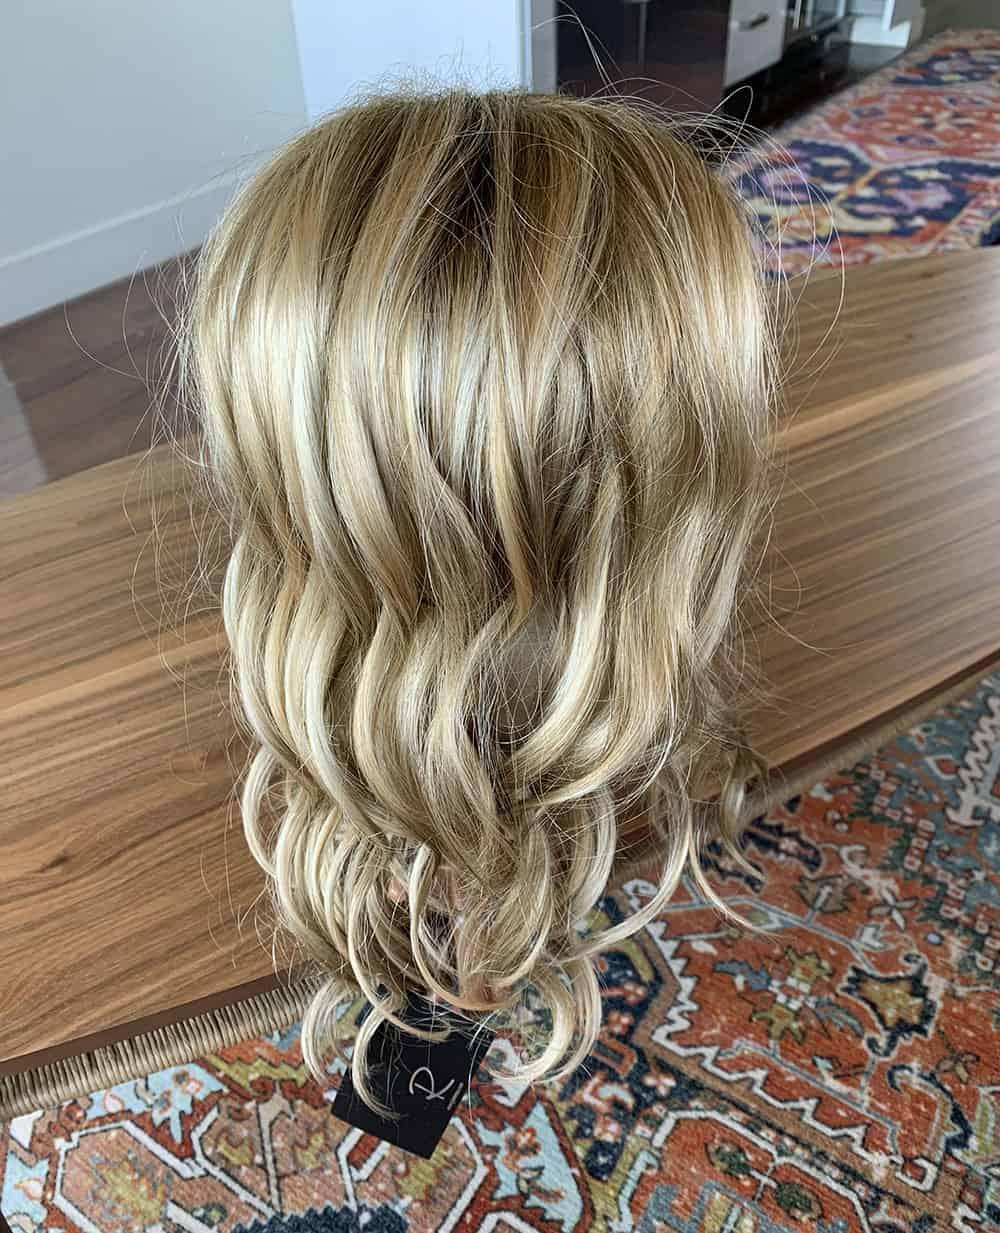 Malibu Blonde Color #12FS12 Jon Renau Top Wave Hair topper review, Blonde colored hair piece